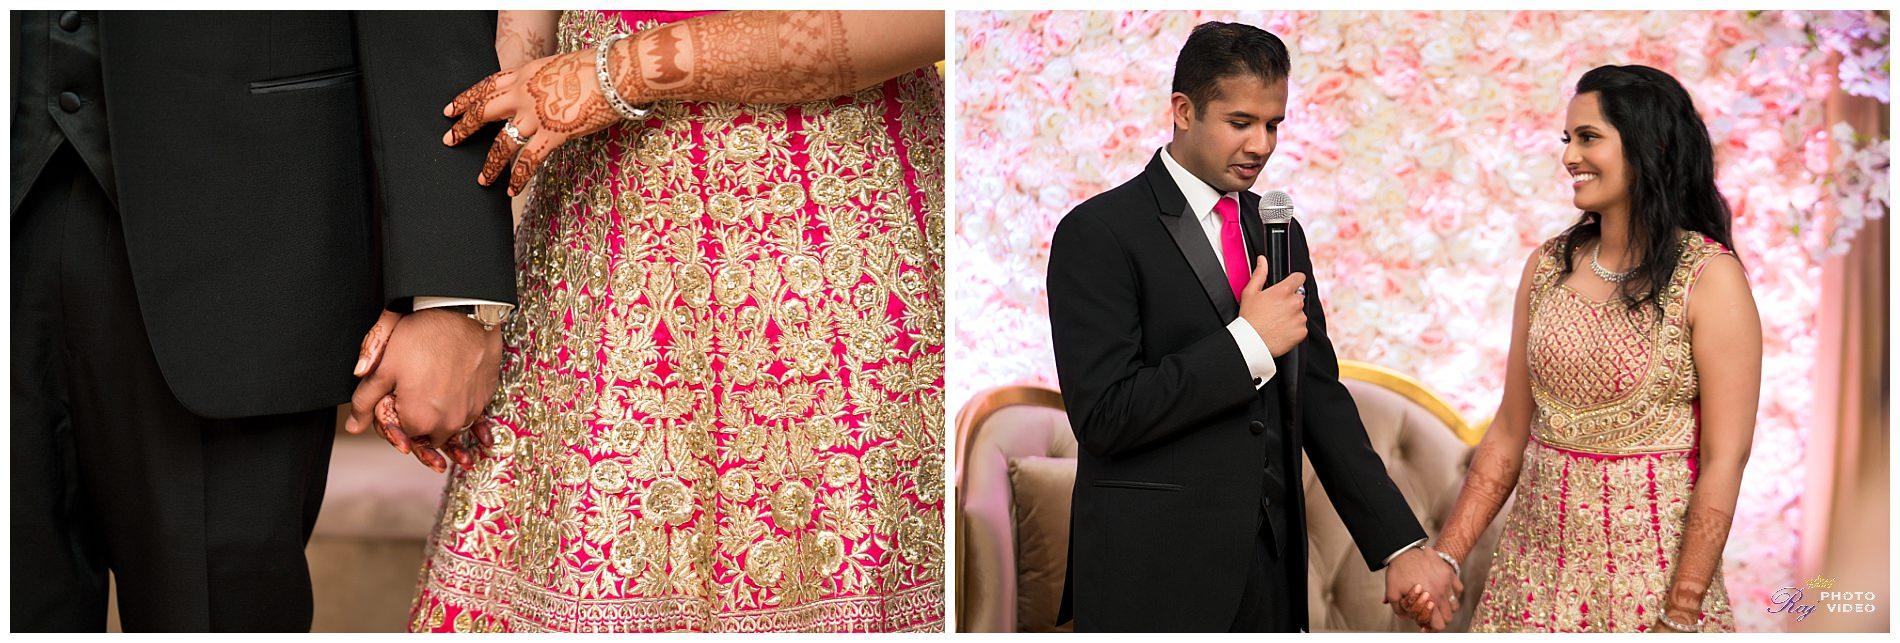 Martinsville-Gardens-NJ-Indian-Wedding-Ruchi-Vishal-69.jpg